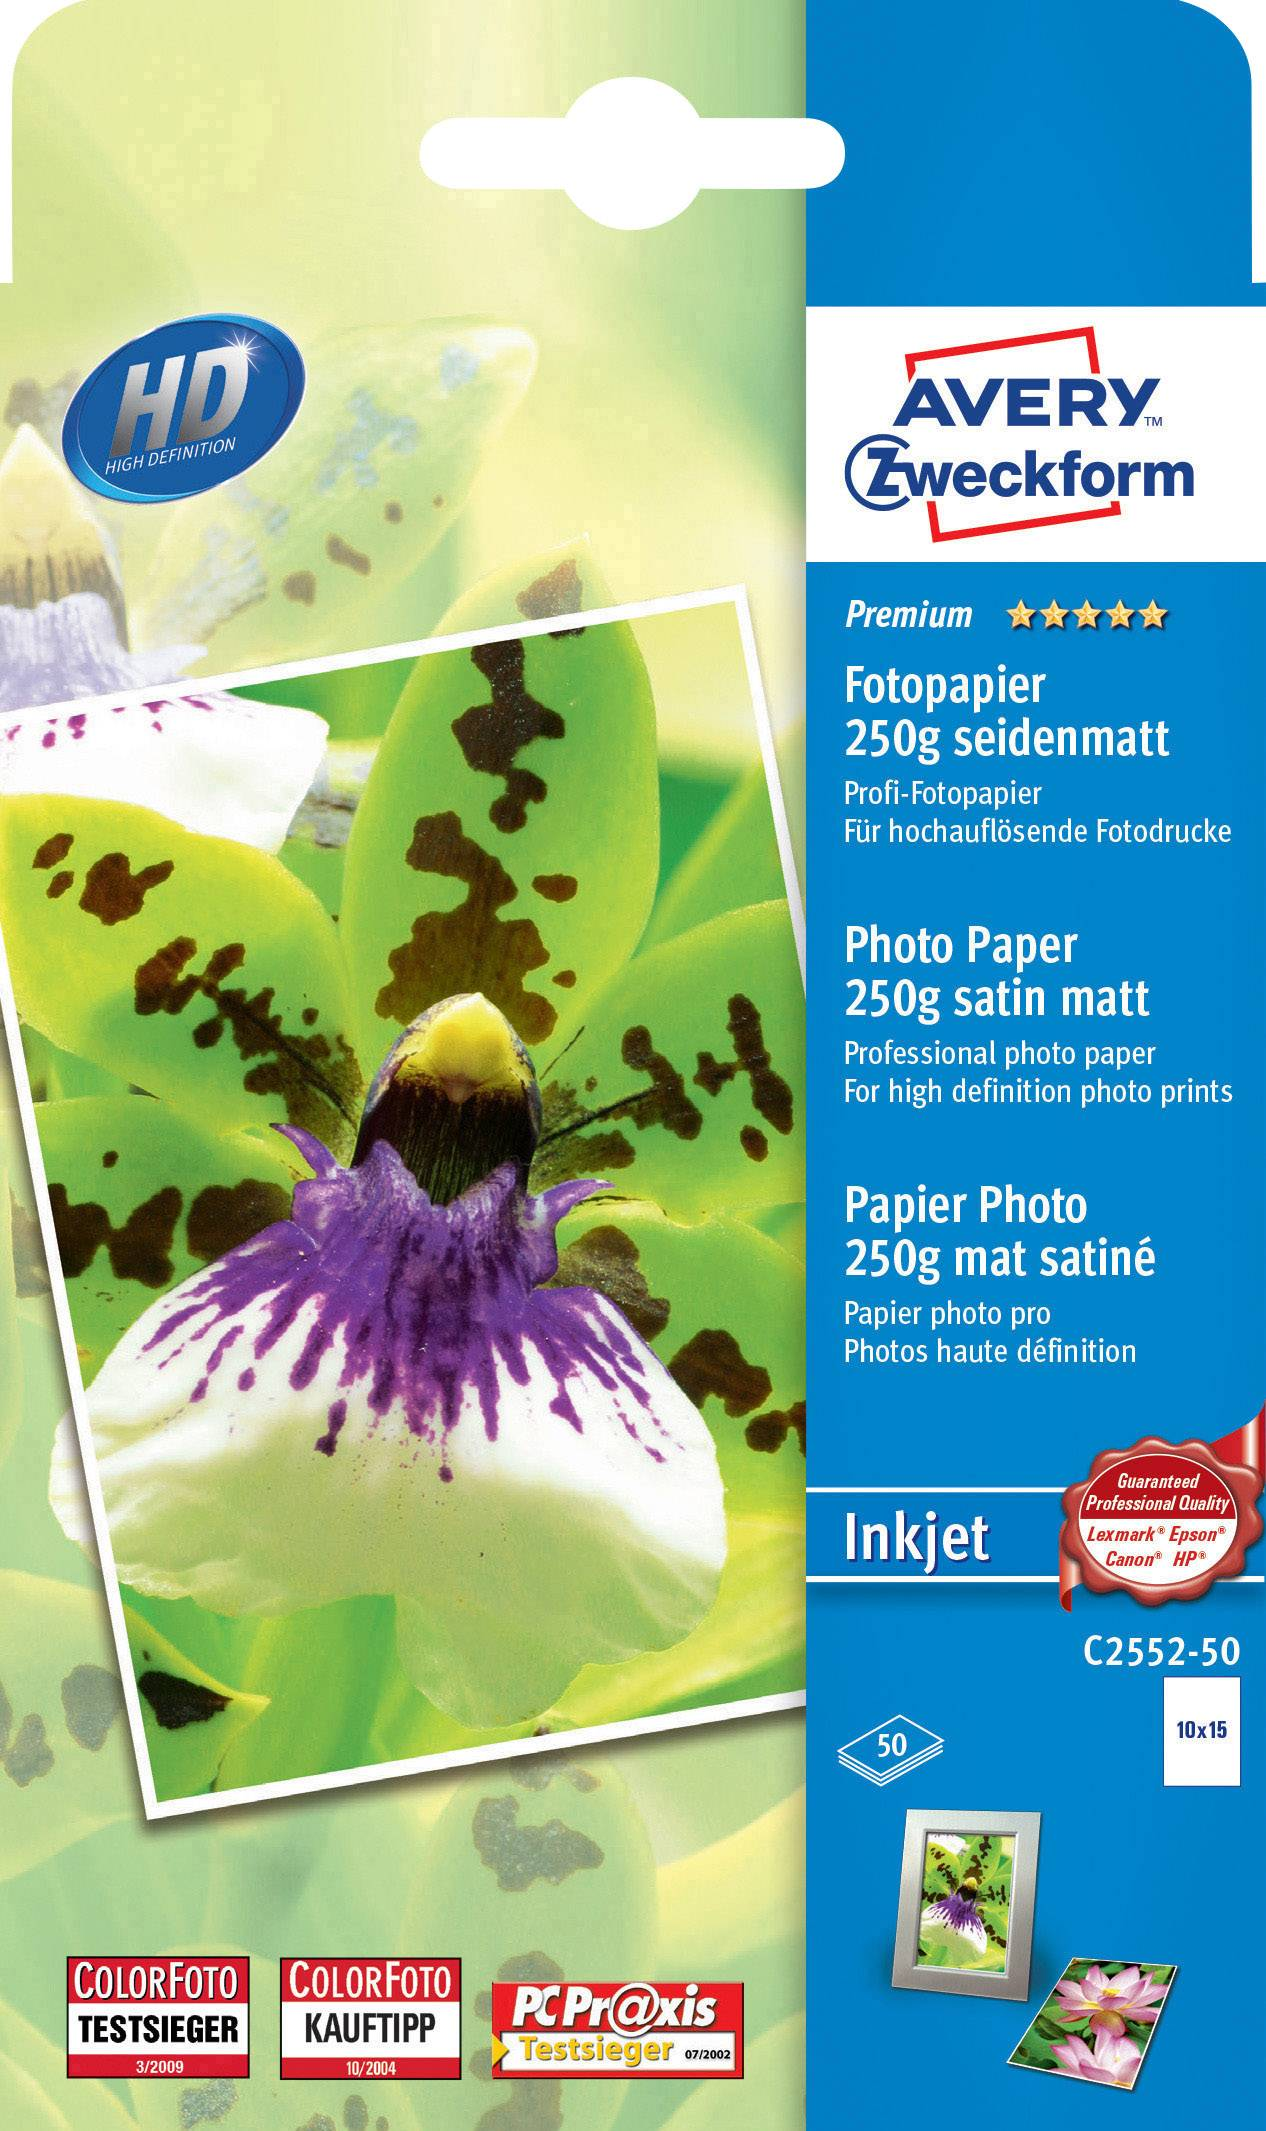 Fotopapír Avery-Zweckform Premium Inkjet C2552-50, 10 x 15, 250 g/m², 50 listů